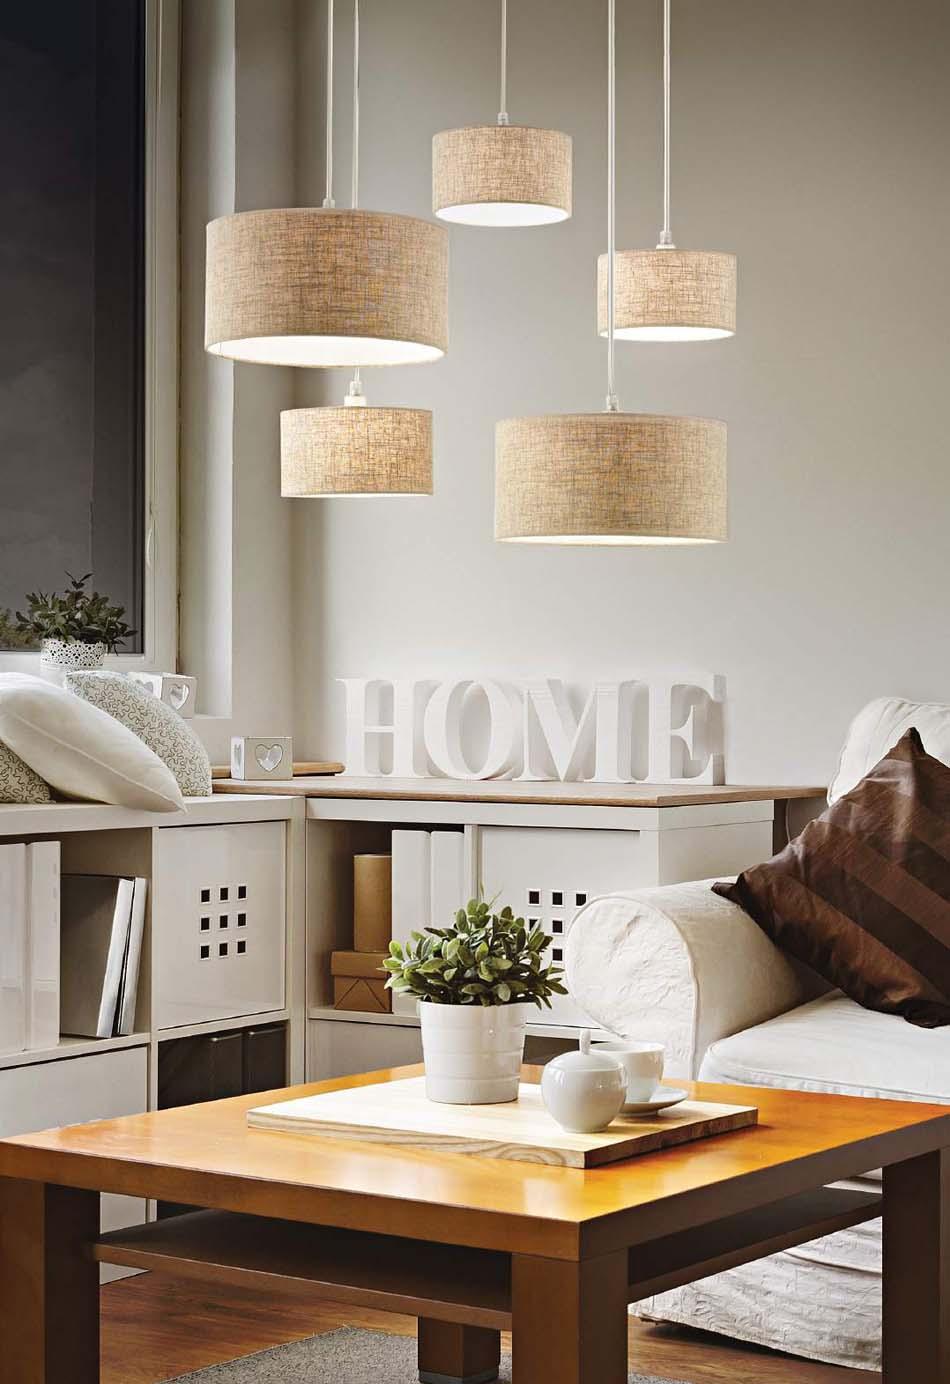 Lampade 43 sospese Ideal Lux Ekos – Toscana Arredamenti